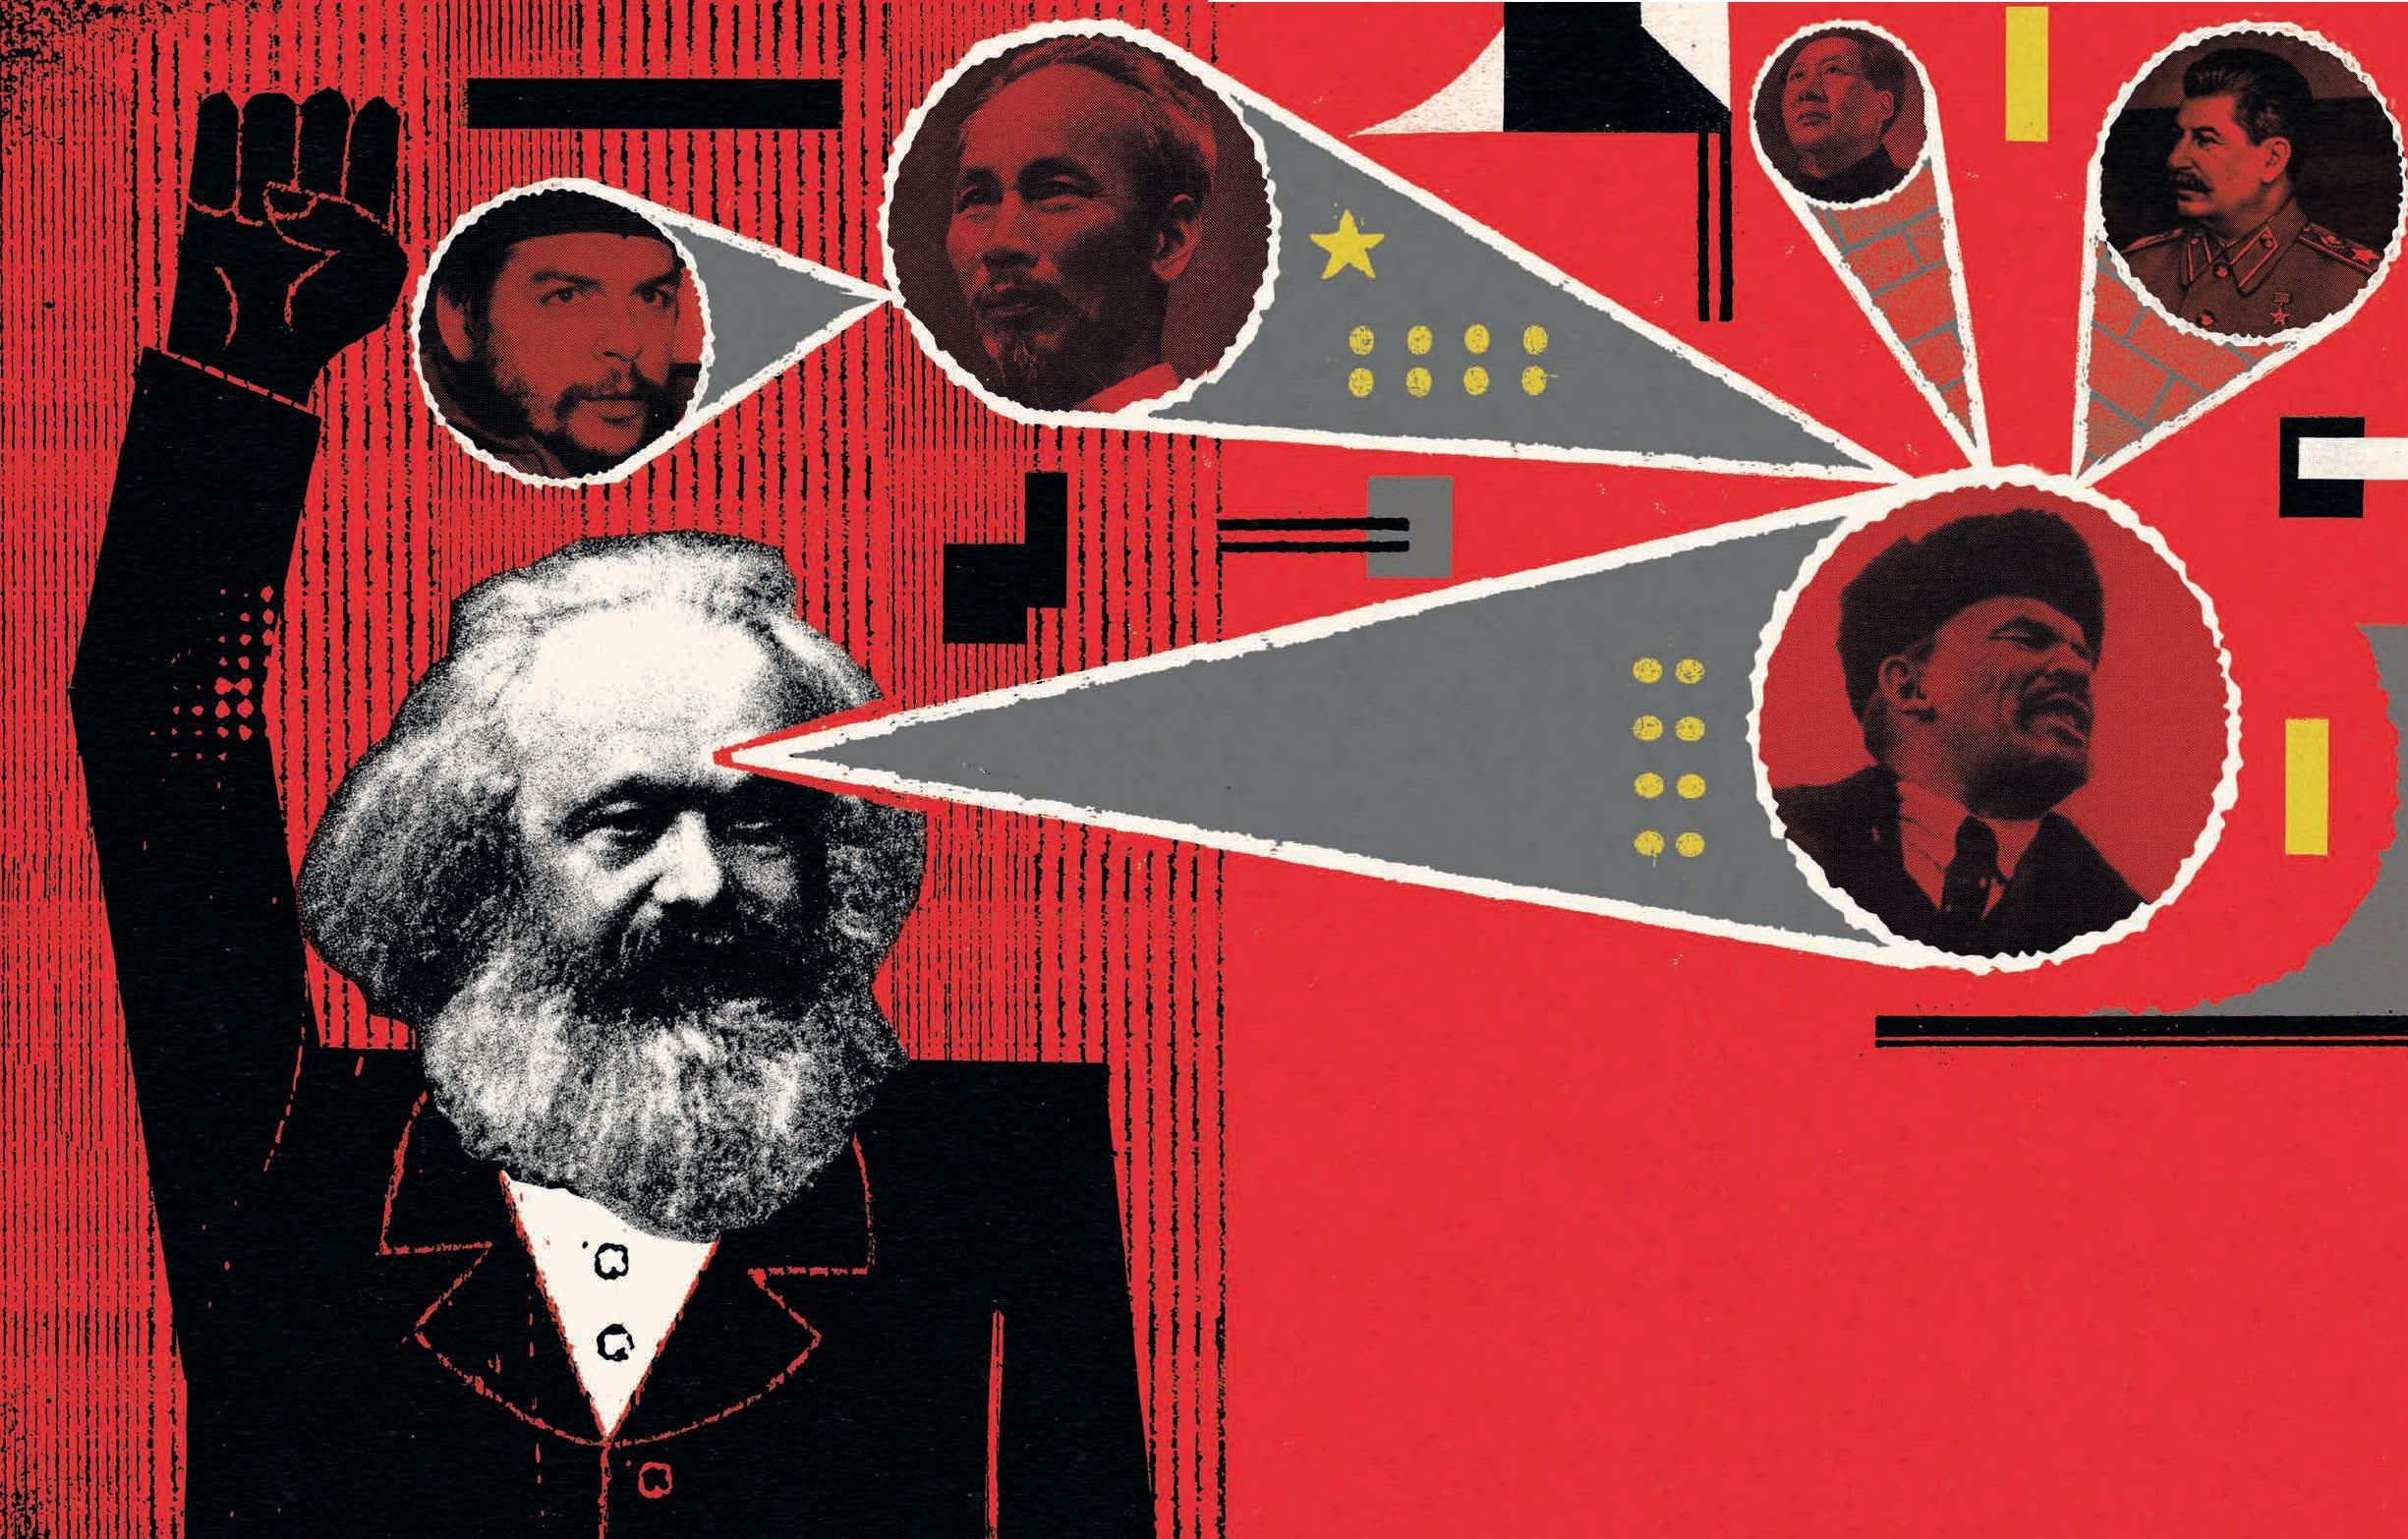 Karl Marx- The Godfather Of Revolution